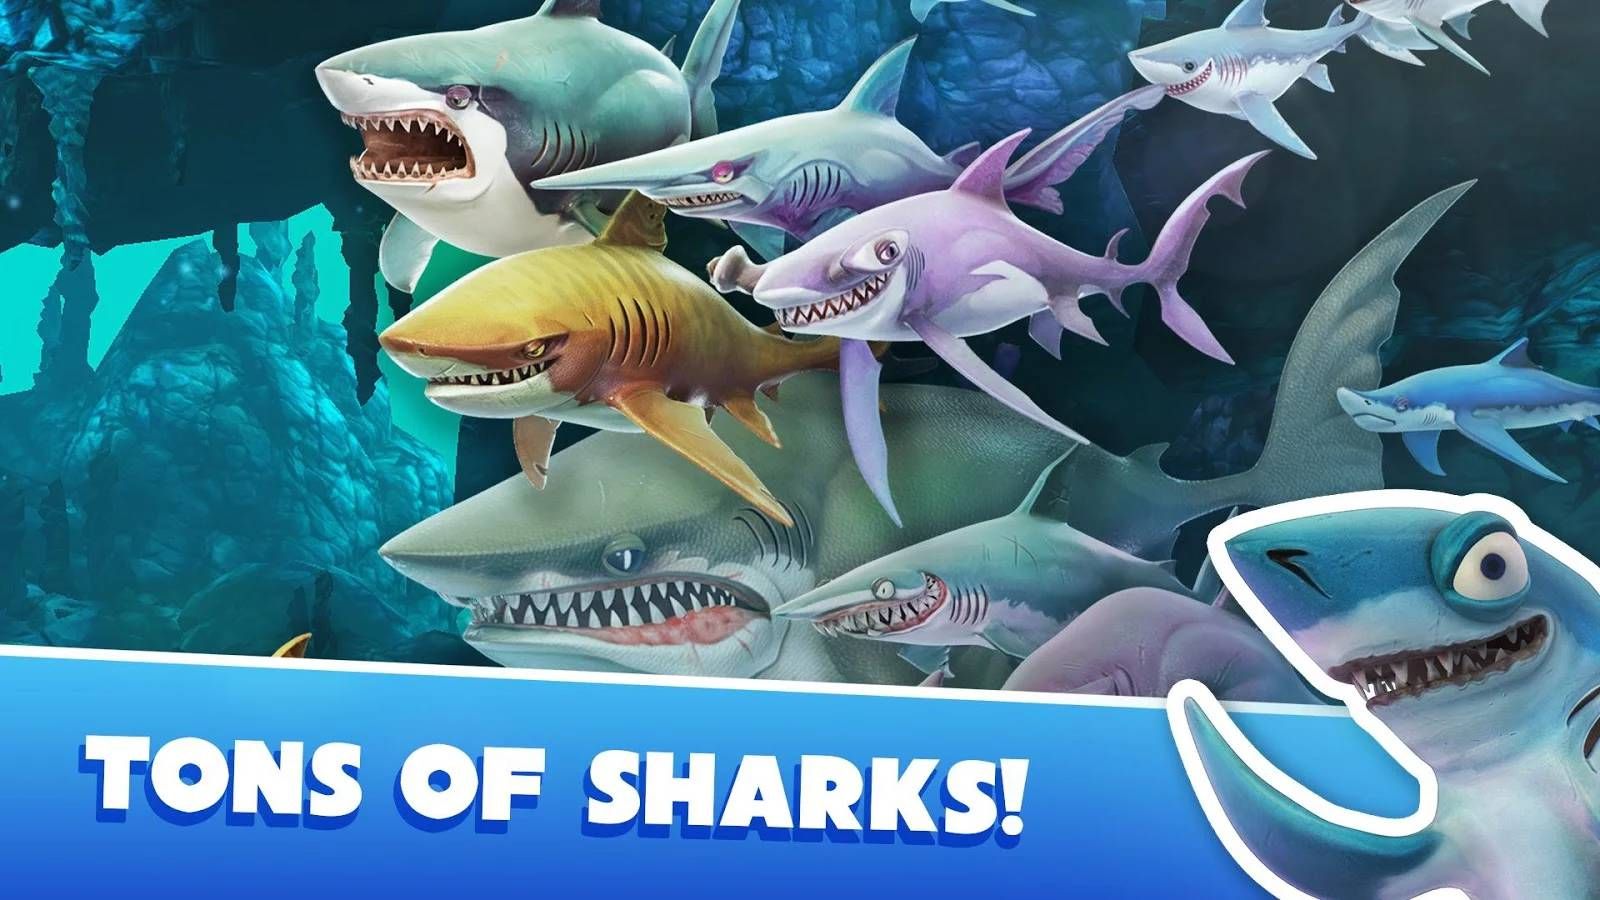 Hungry Shark World 3.0.2 Para Hileli Mod Apk indir » APK Dayı - Android Apk indir